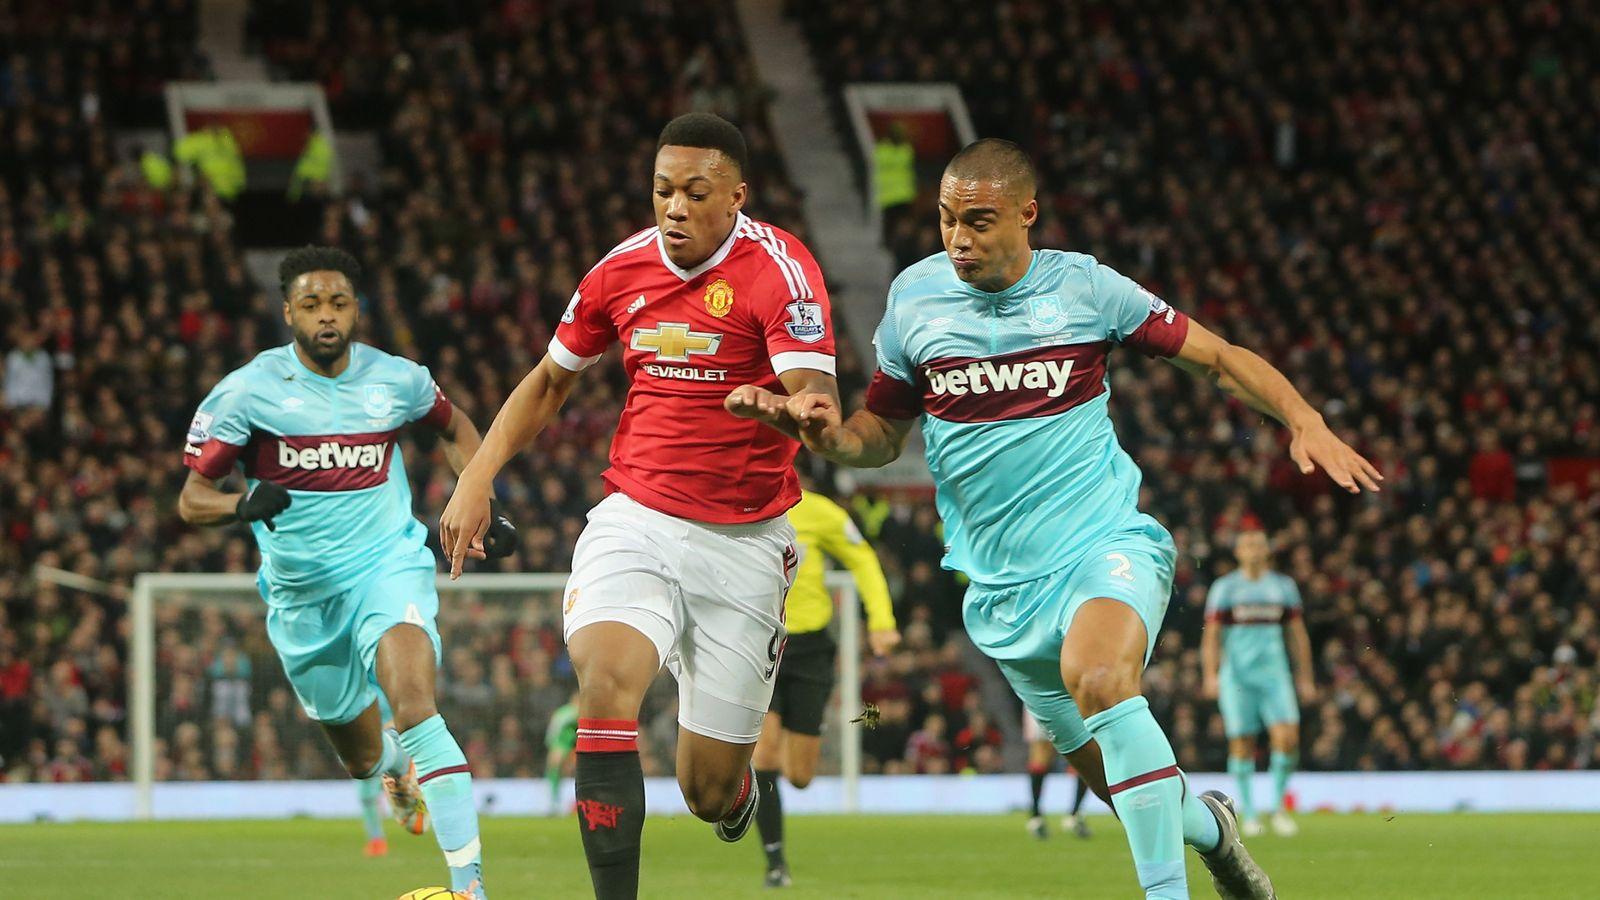 Man Utd 0 - 0 West Ham - Match Report & Highlights